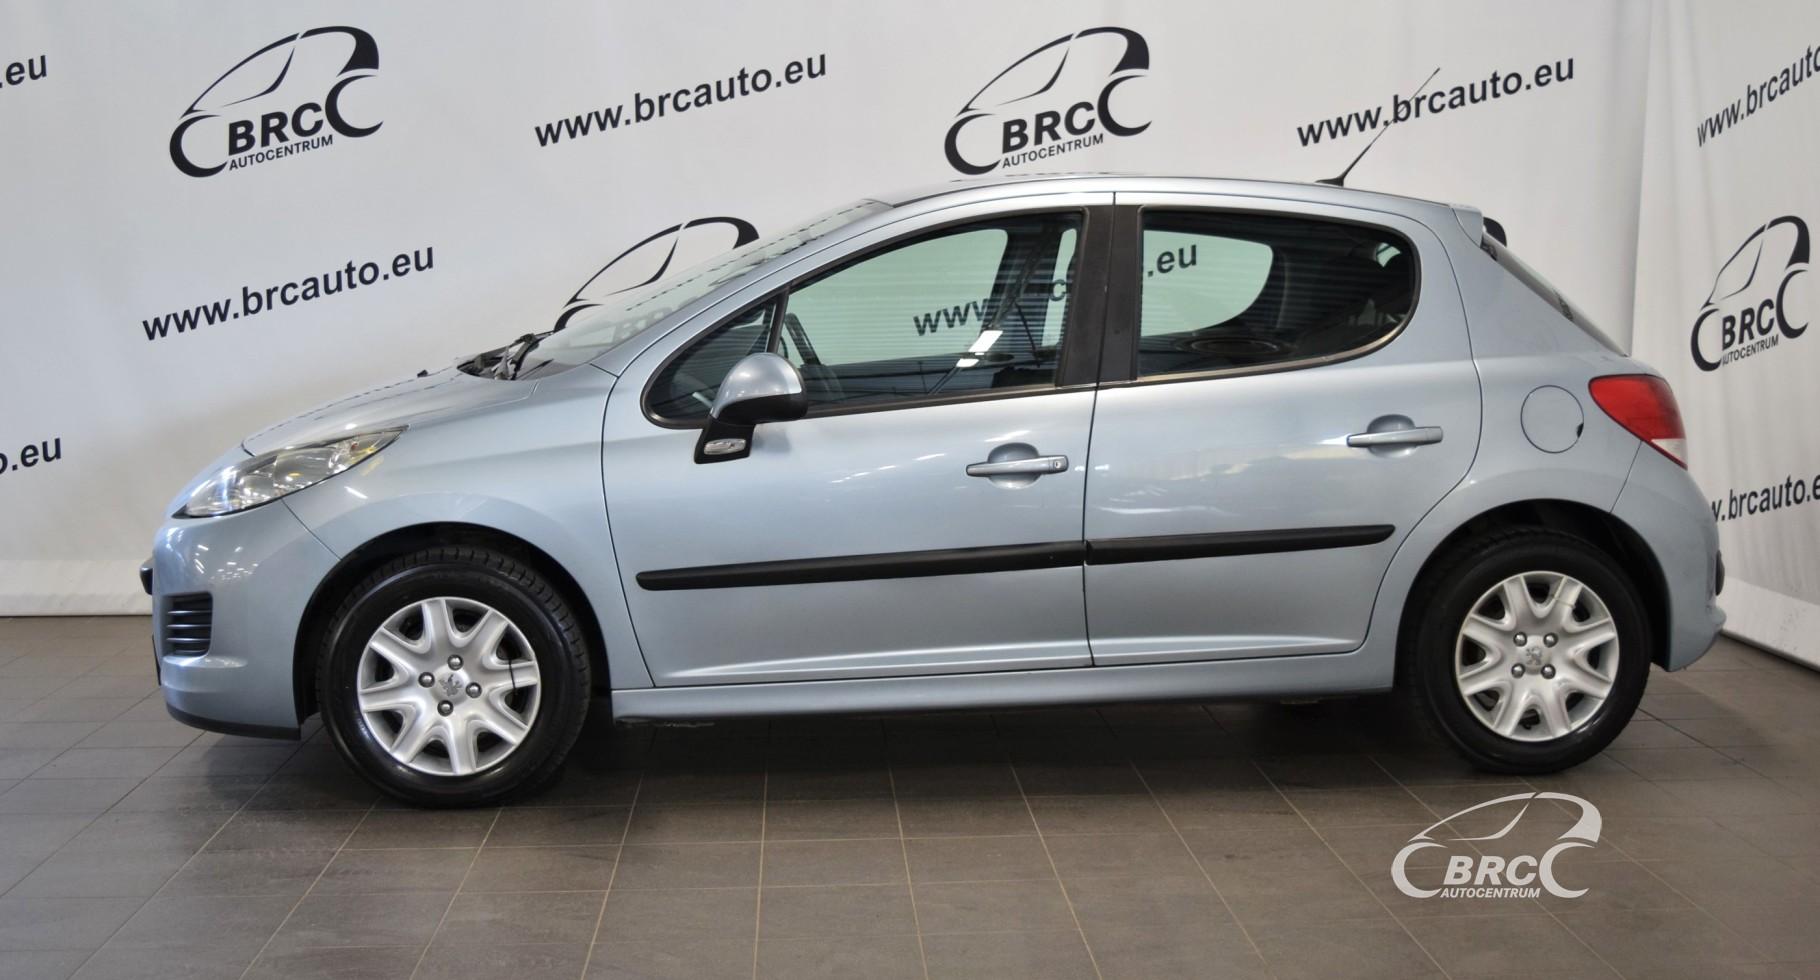 Peugeot 207 HDi M/T